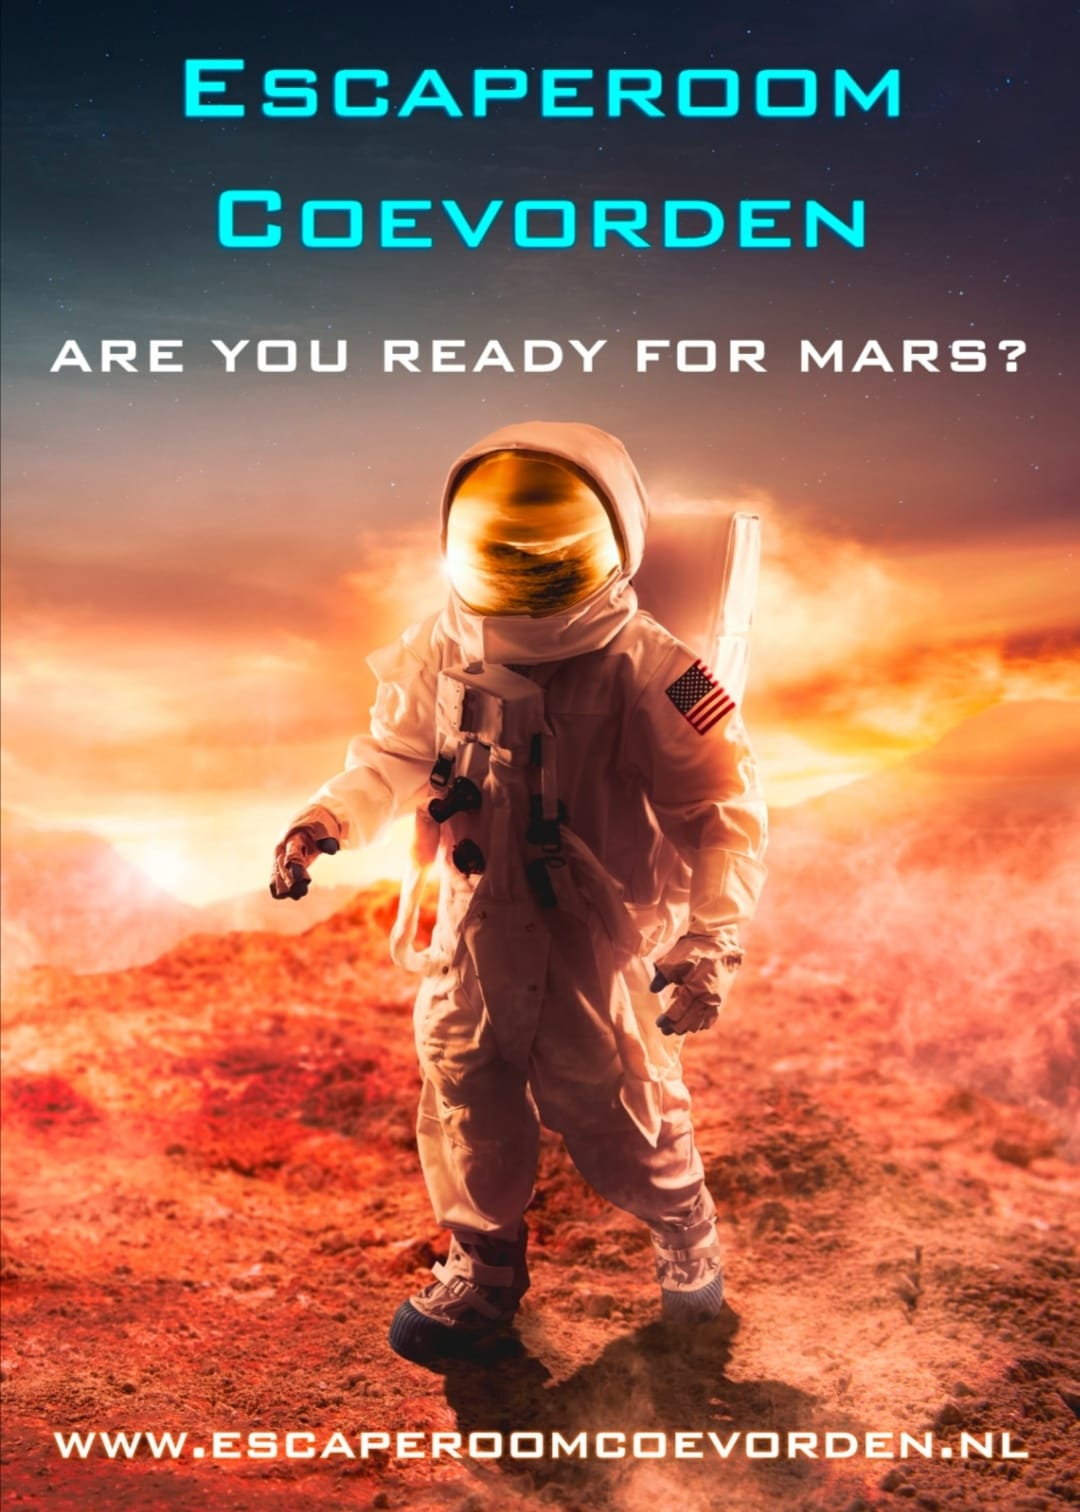 alt-escaperoom coevorden mission mars